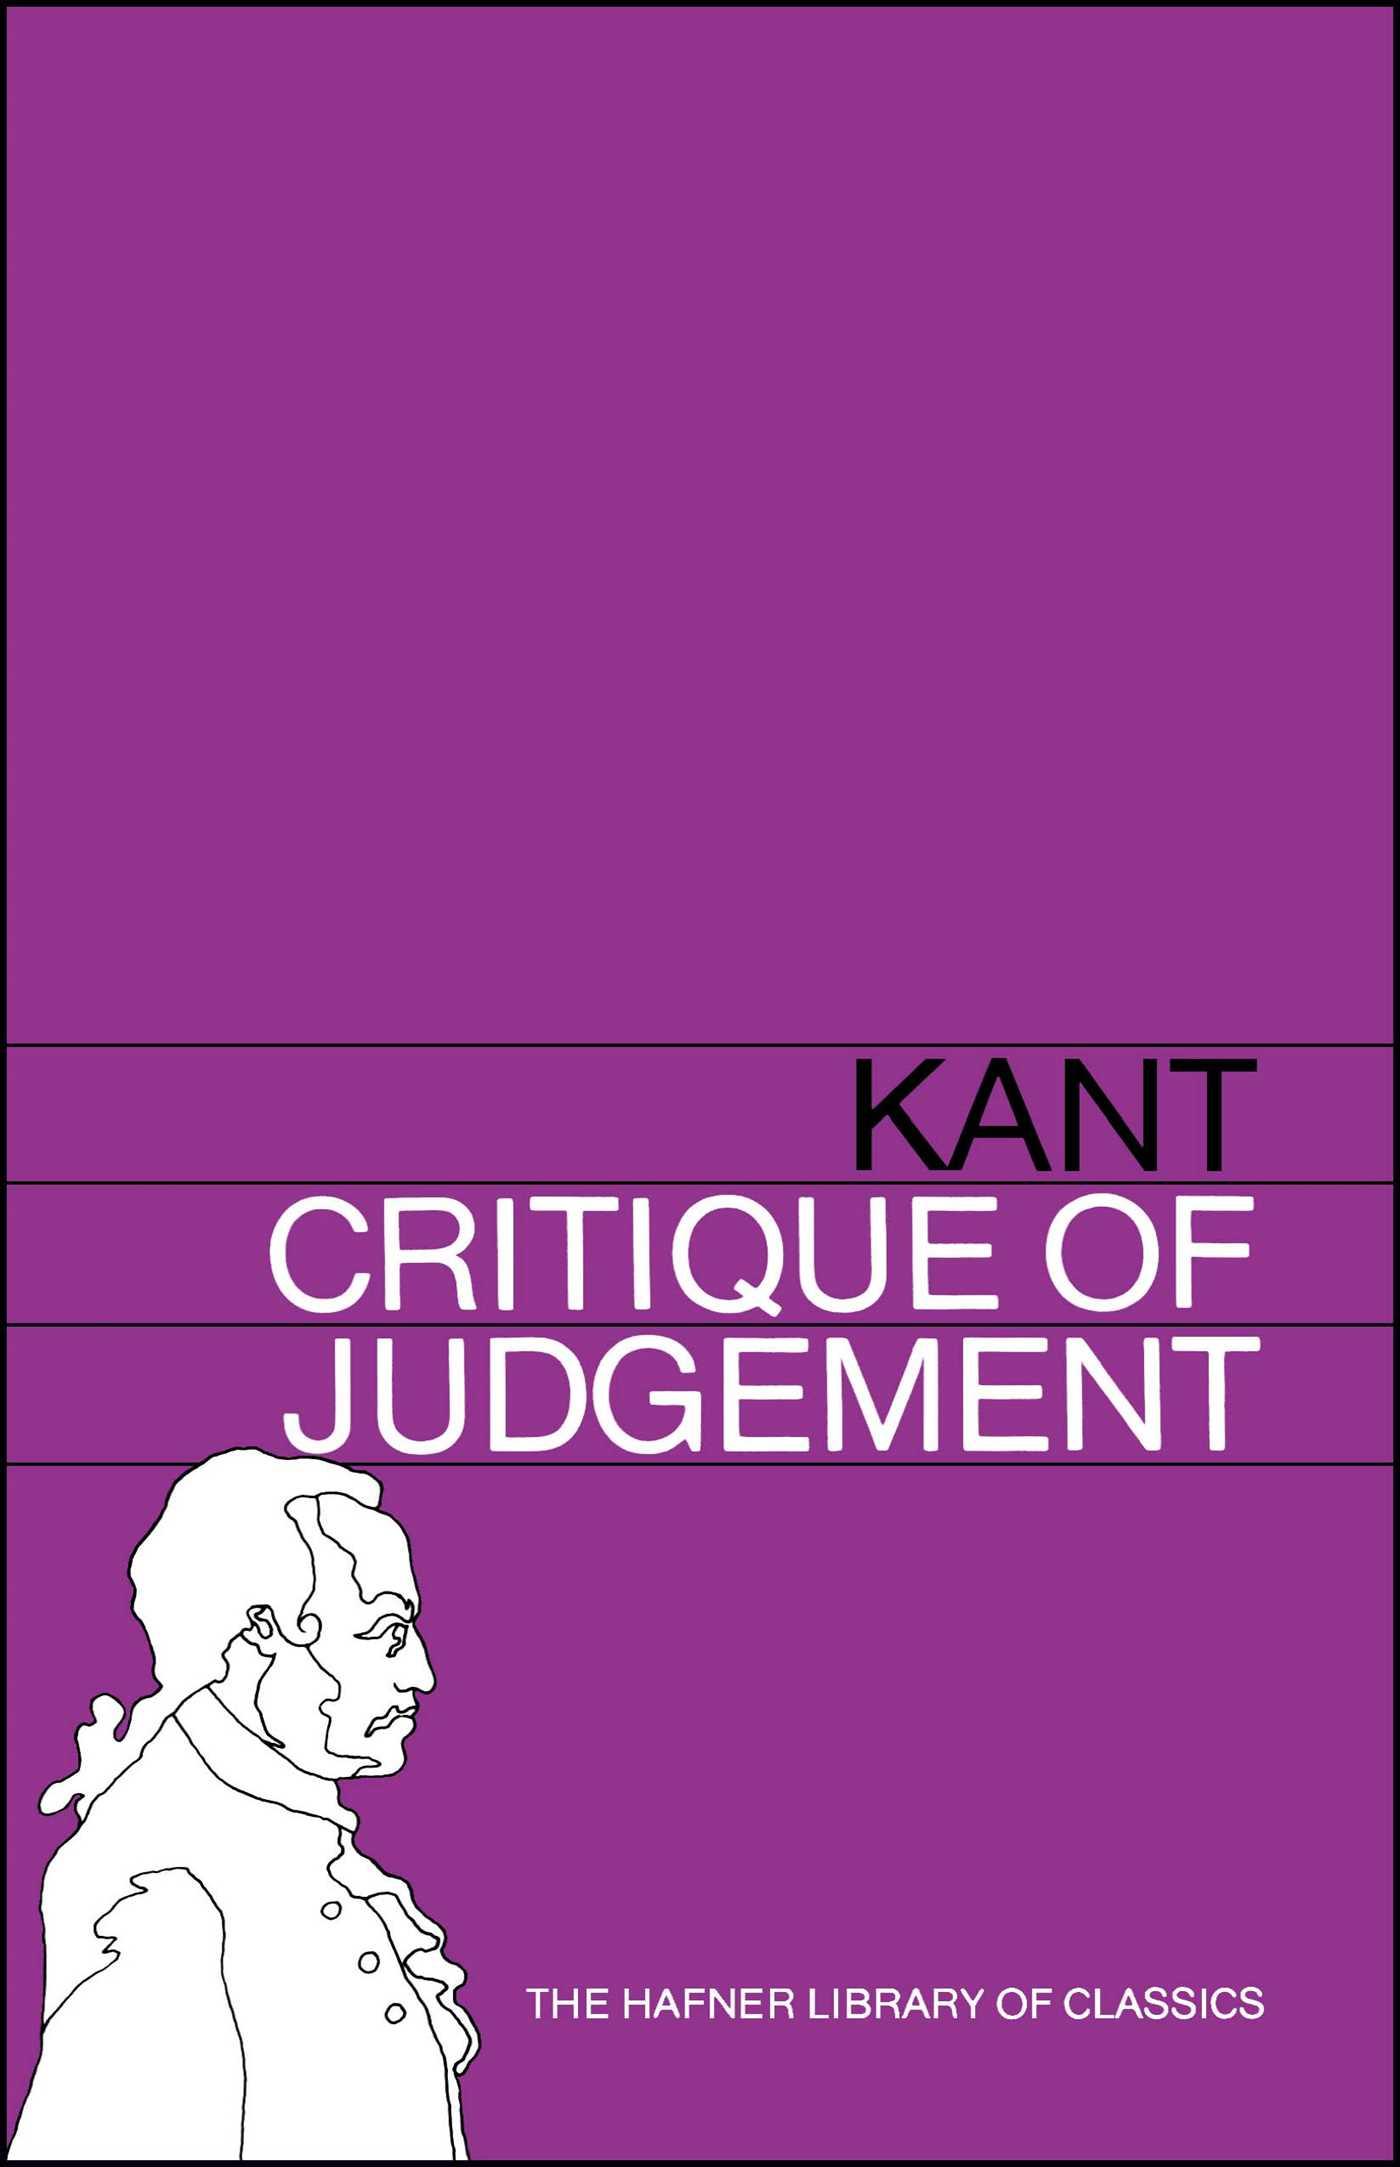 Critique of judgement 9780028475004 hr